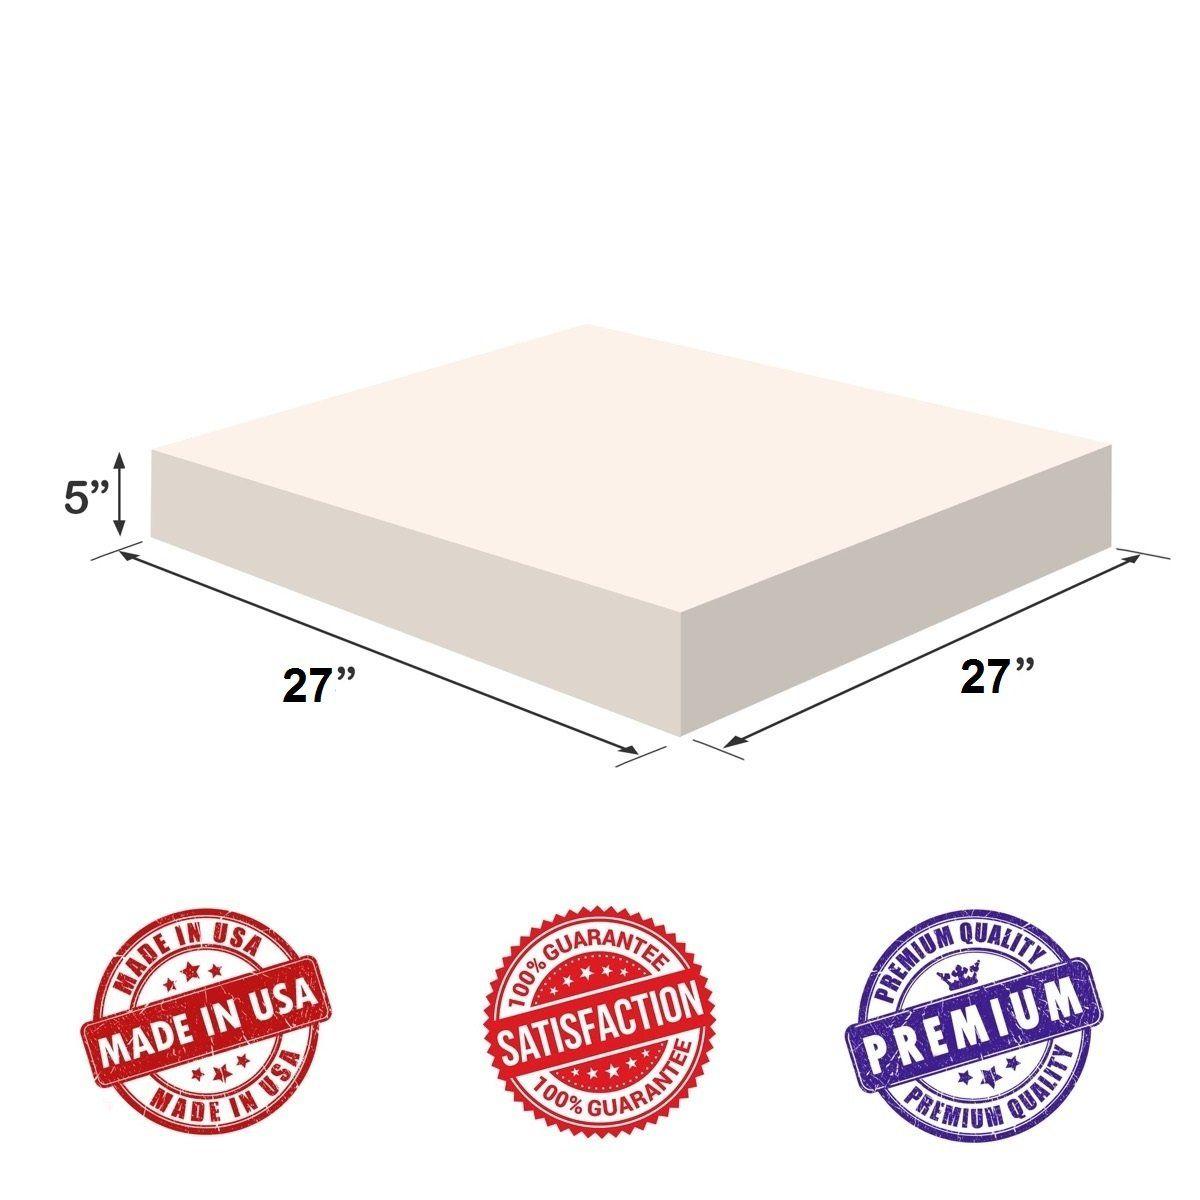 Upholstery Foam Square Cushion Sheet 5x27x27 High Density Soft Premium Luxury Qualitygood For Chair Cushionssofa Cushions Wheelchai Upholstery Foam Cushions On Sofa Foam Sheets